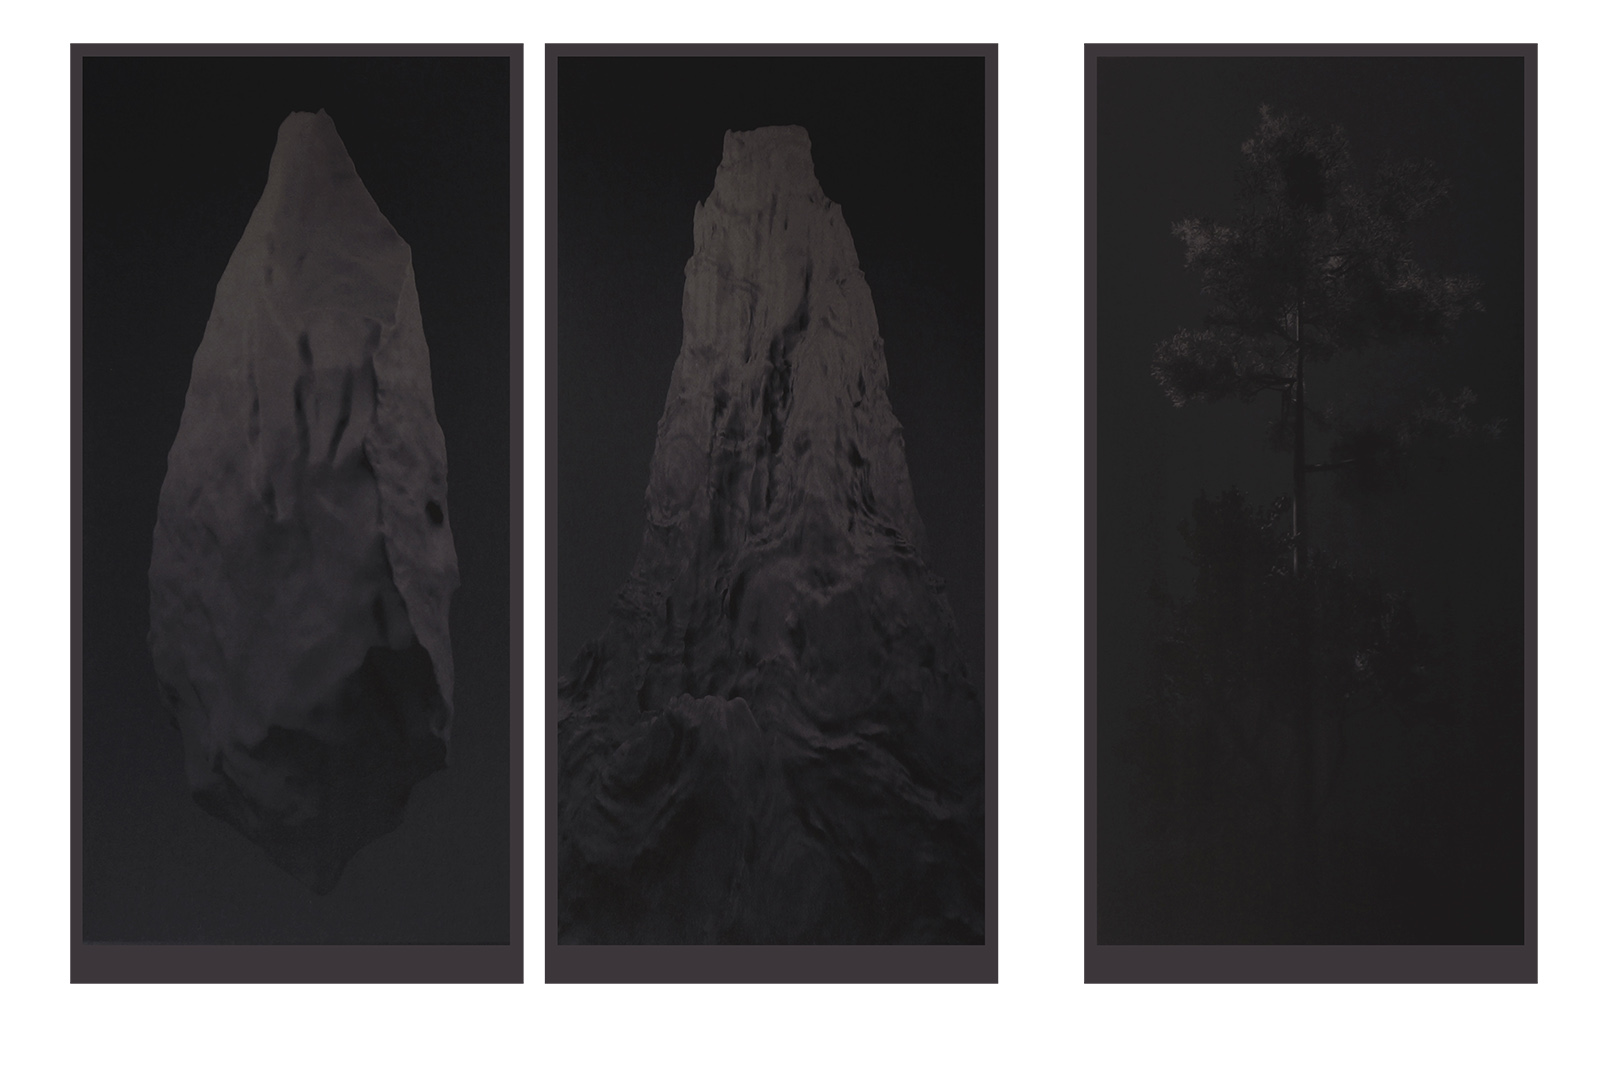 Alexandra Crouwers, 3 prints, 2016, 33 x 65cm